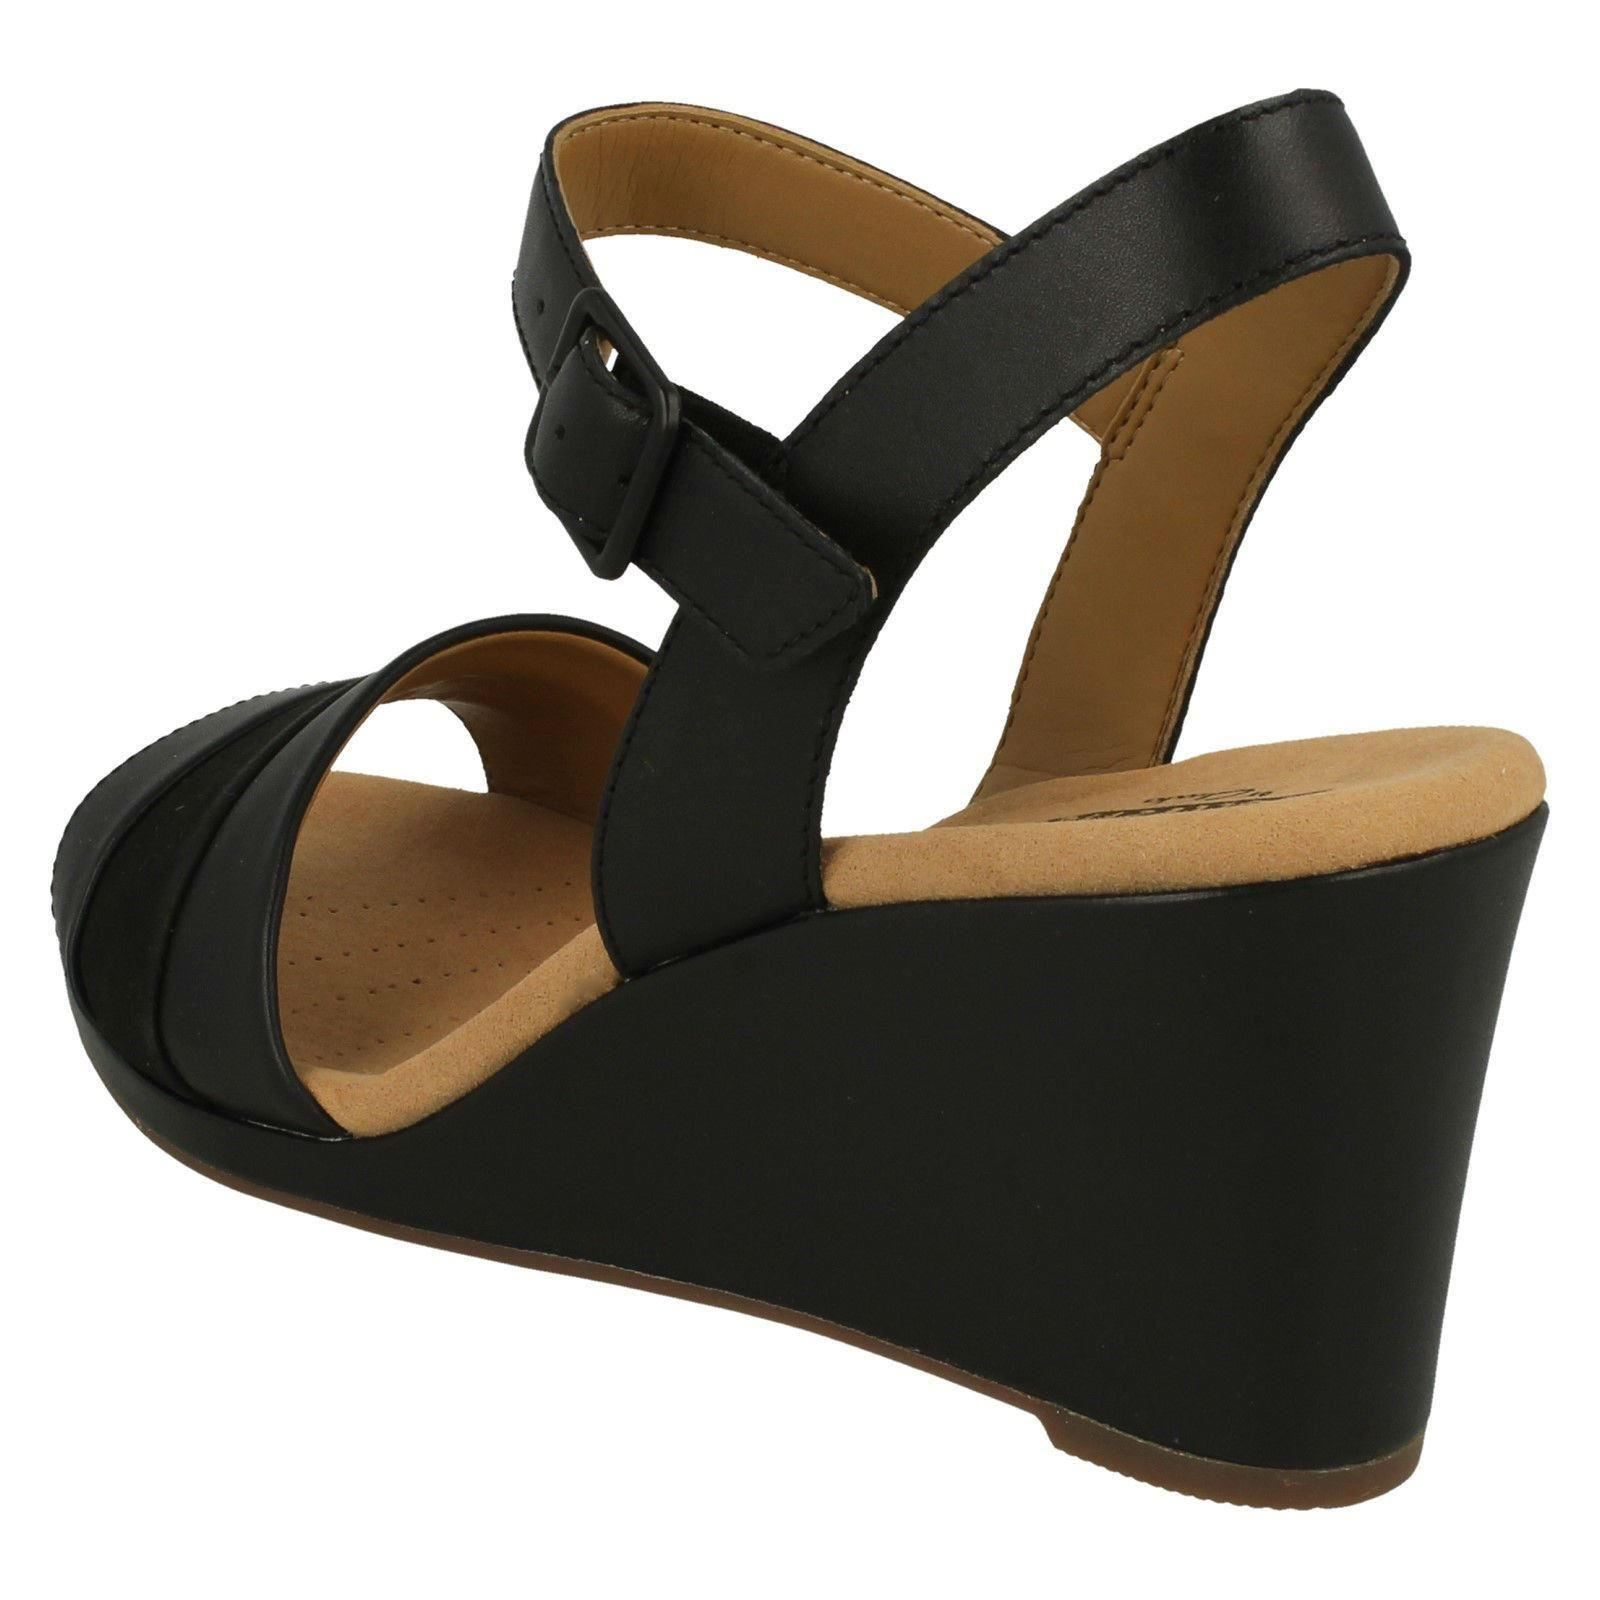 Damenschuhe Clarks Wedged Heel Sandales Sandales Sandales Lafley Aletha b23dd4